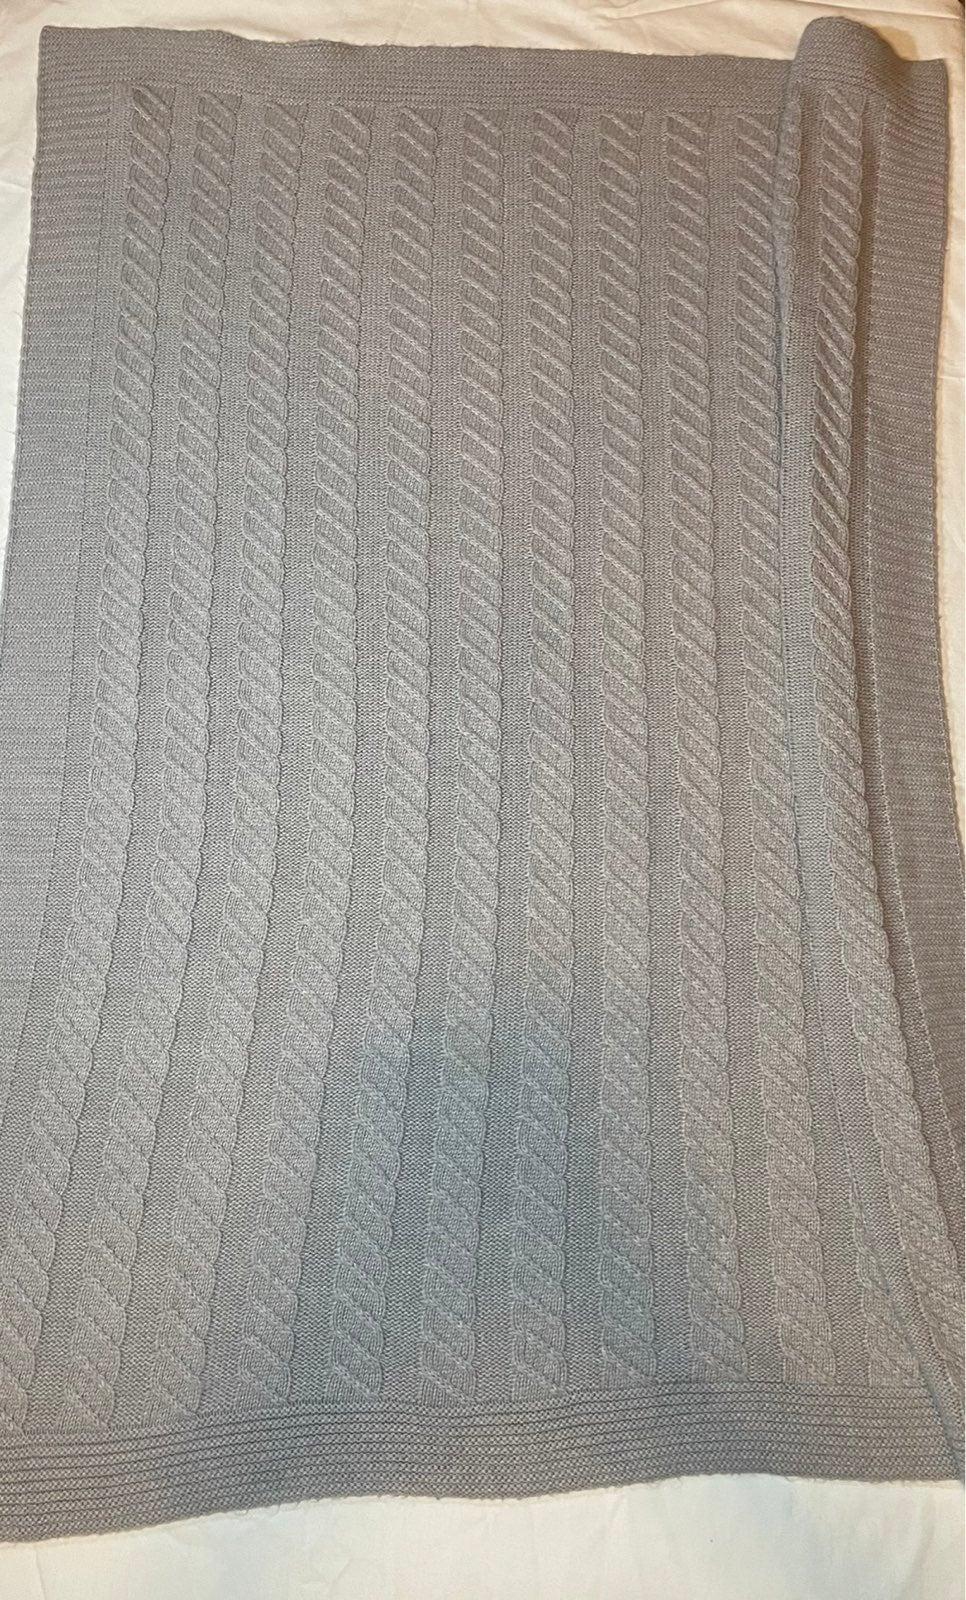 Pottery barn baby blanket grey